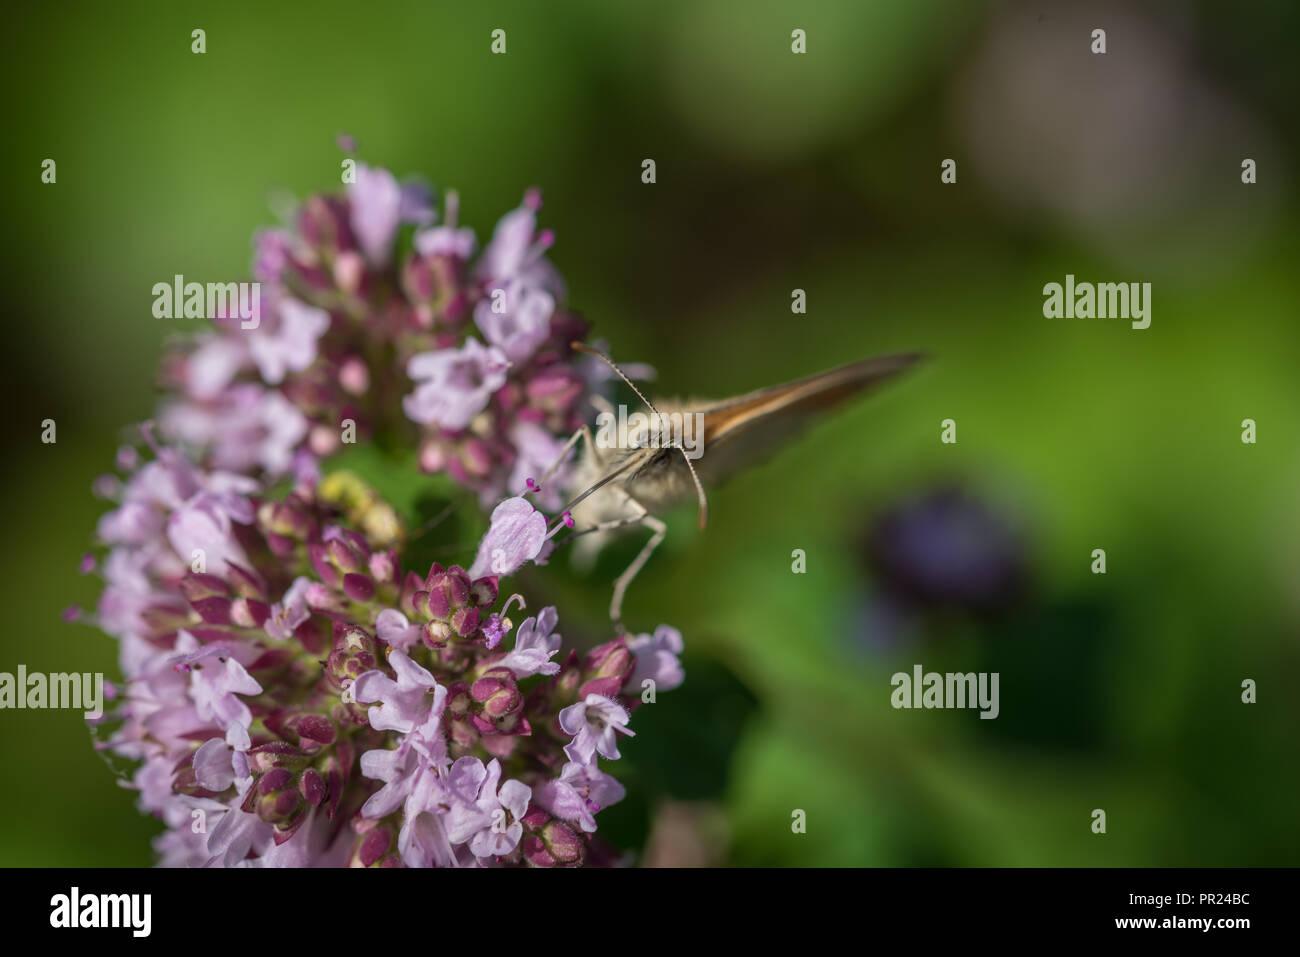 Schmetterling - Stock Image